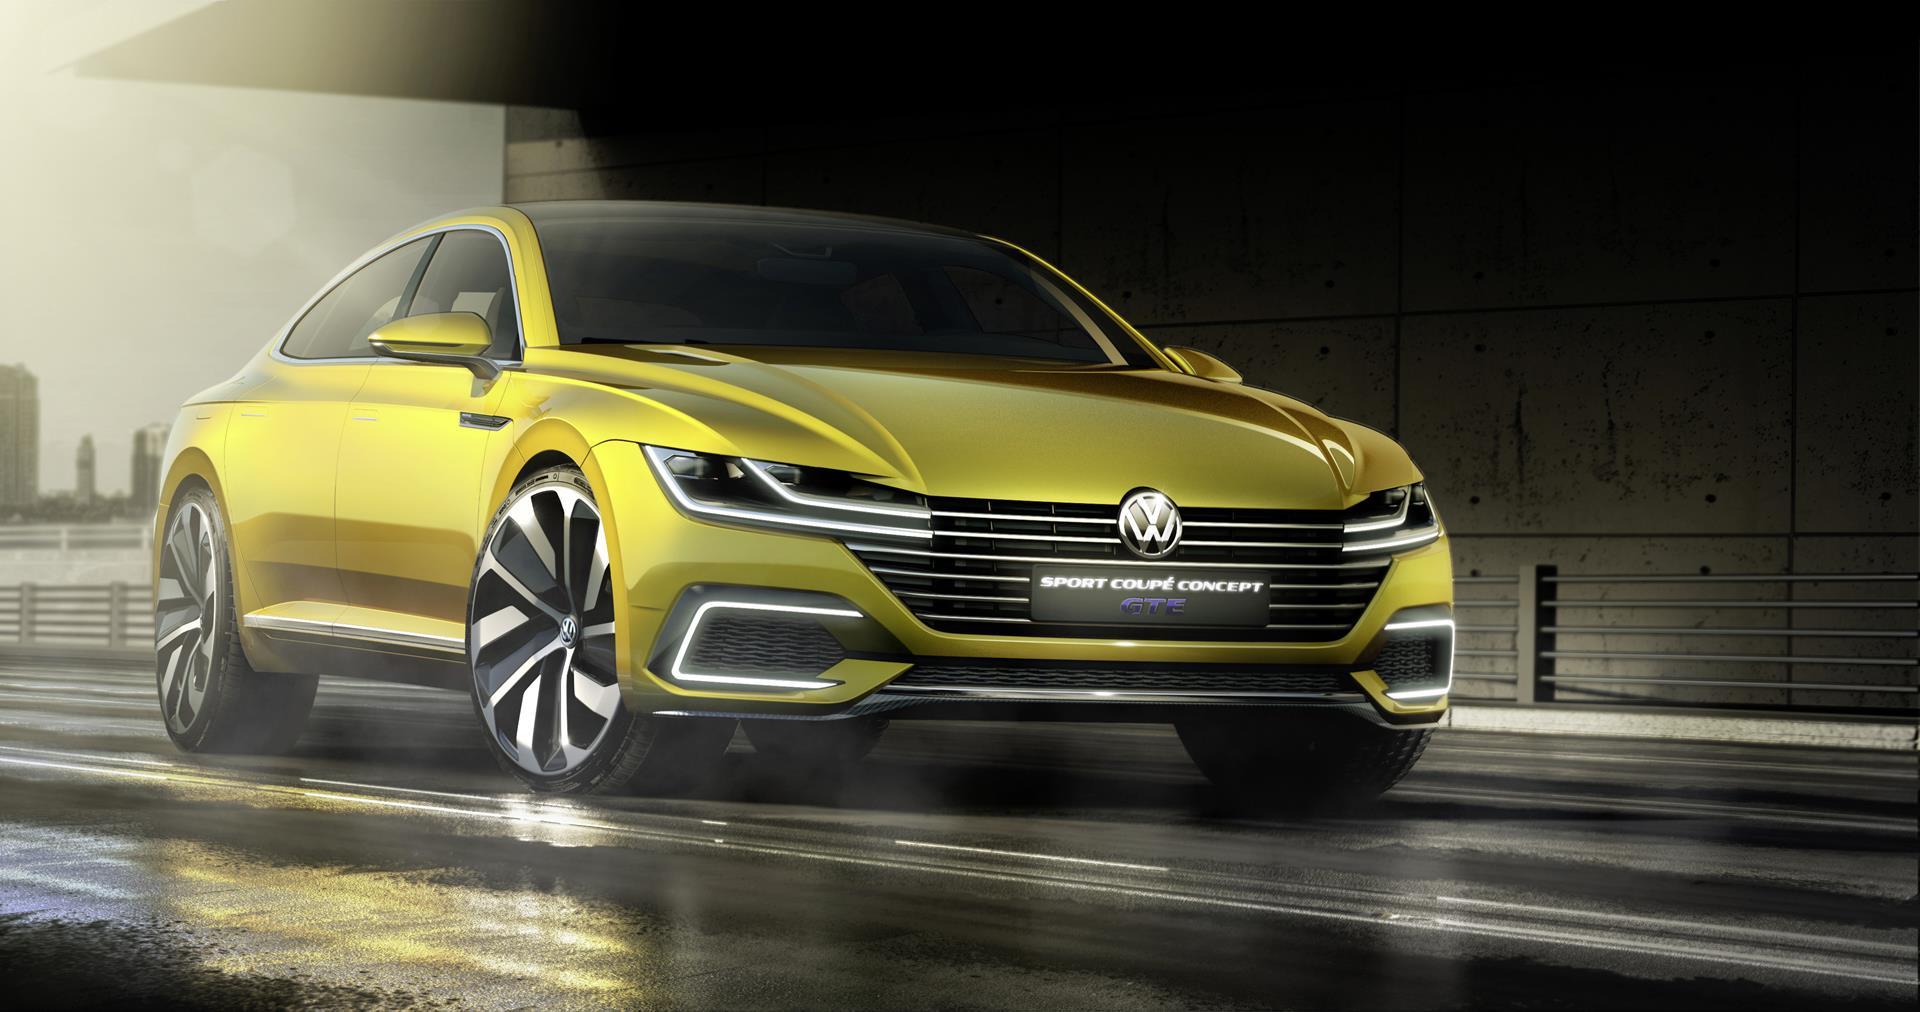 2015 Volkswagen Sport Coupé Concept GTE News and ...